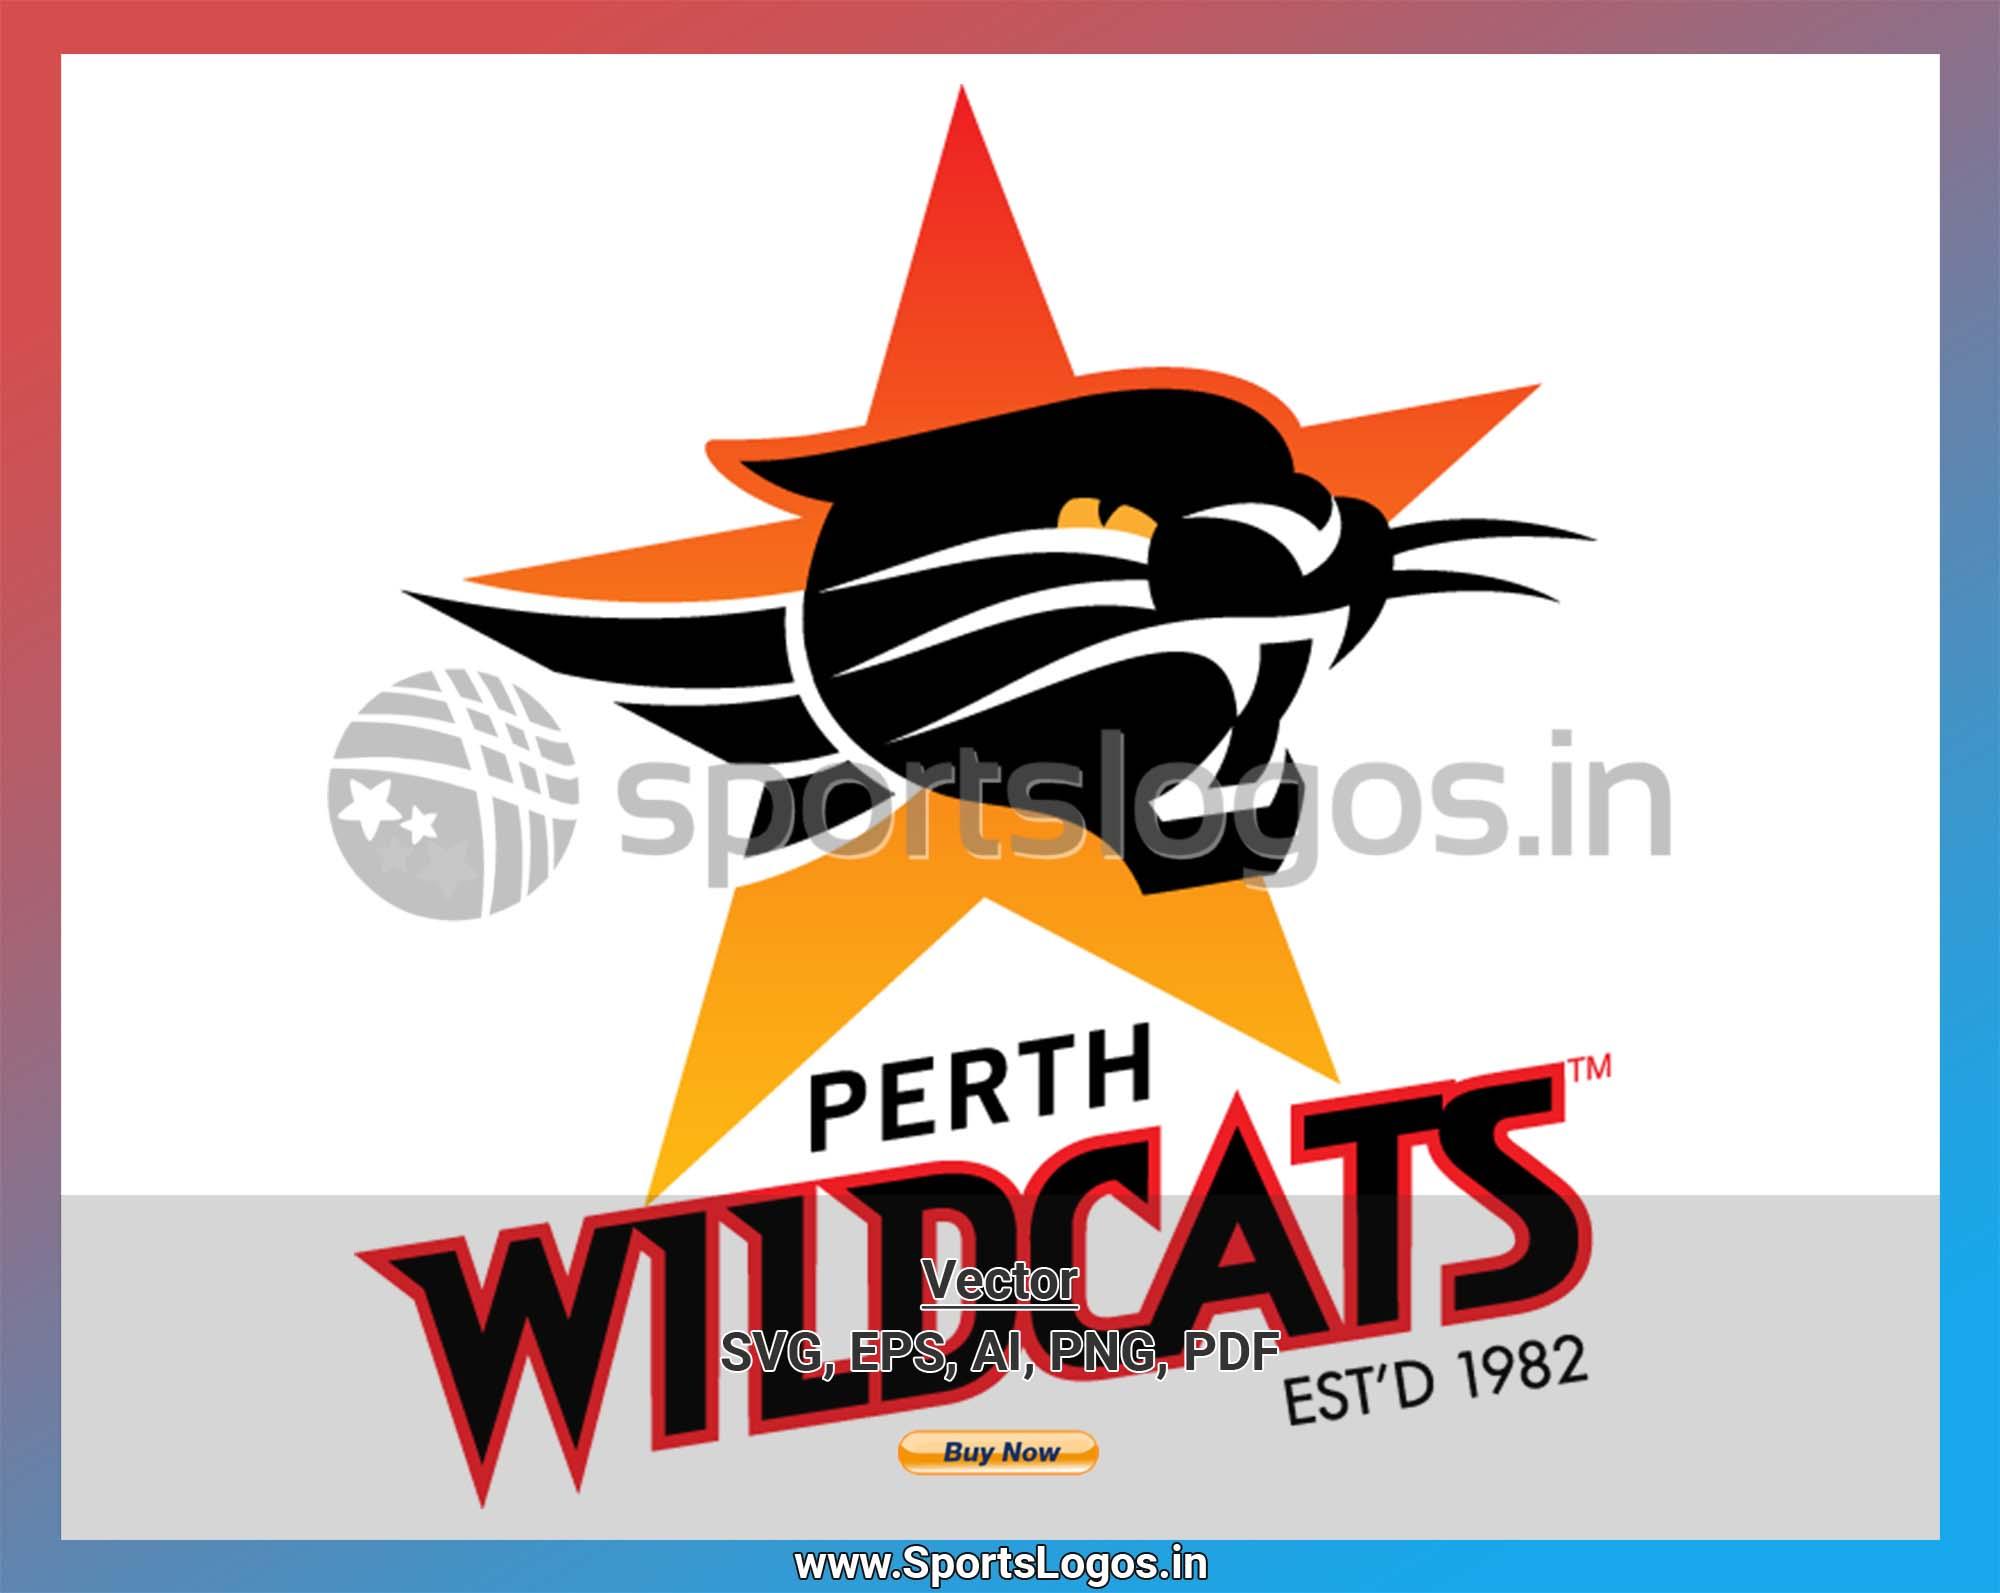 Perth Wildcats.